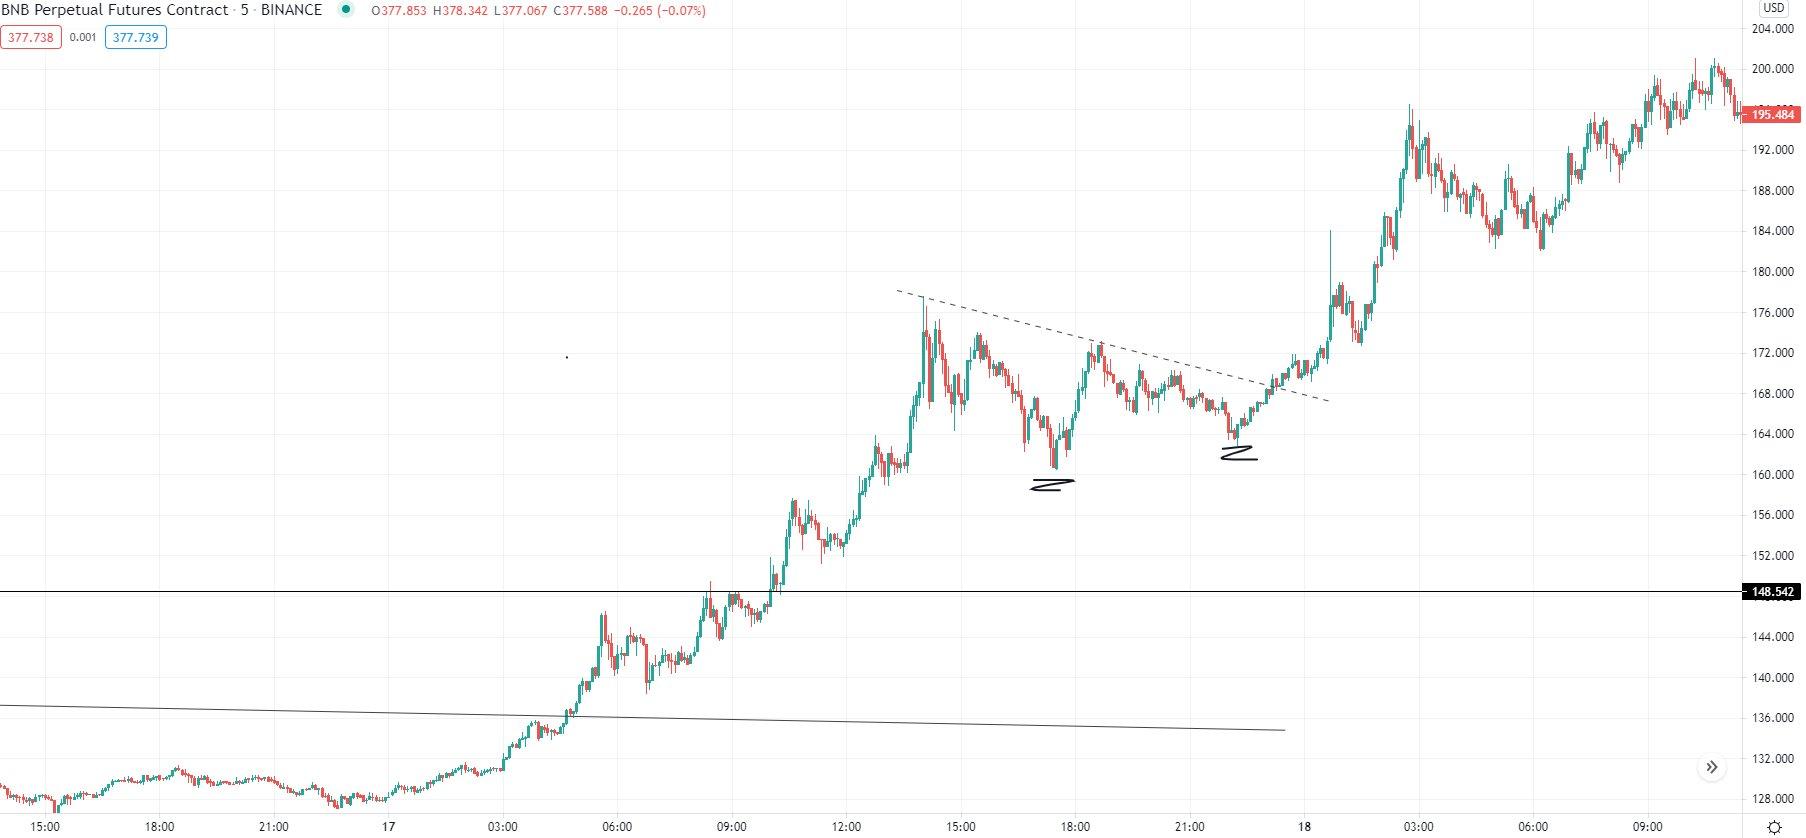 bnb btc prekybos požiūris bitcoin trading gst